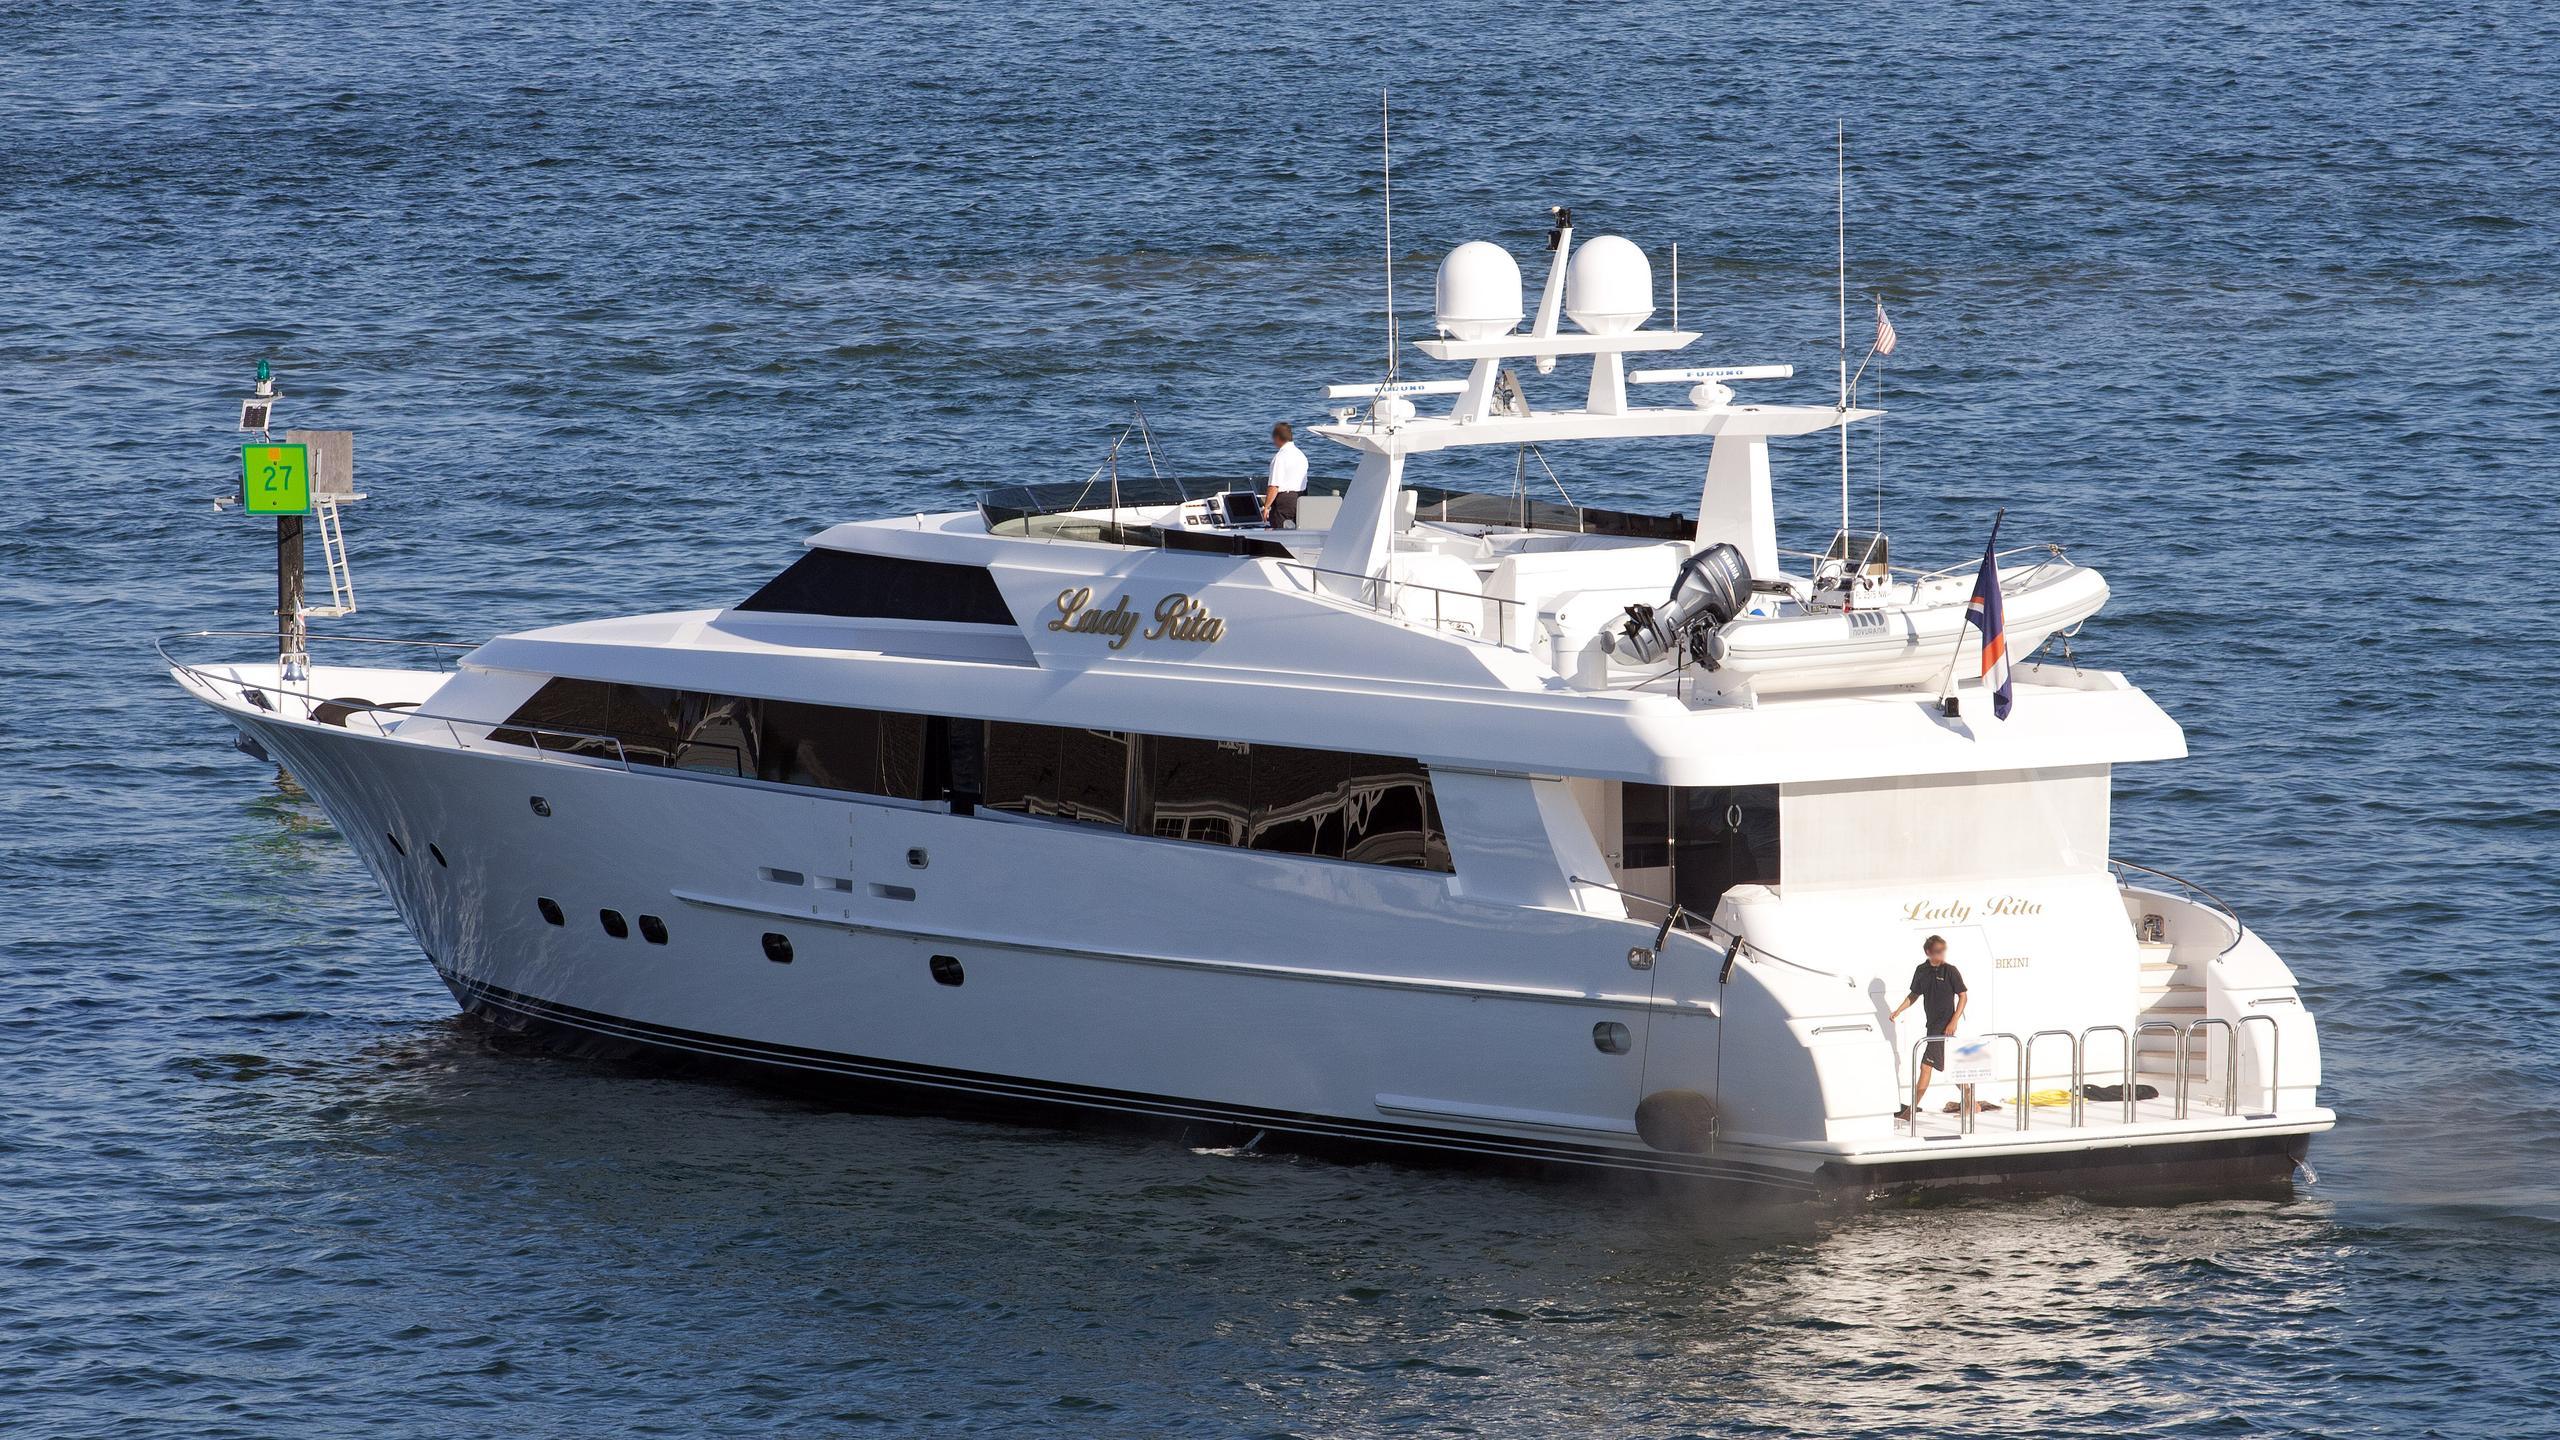 marbella-ii-motor-yacht-northcoast-114-1998-35m-half-profile